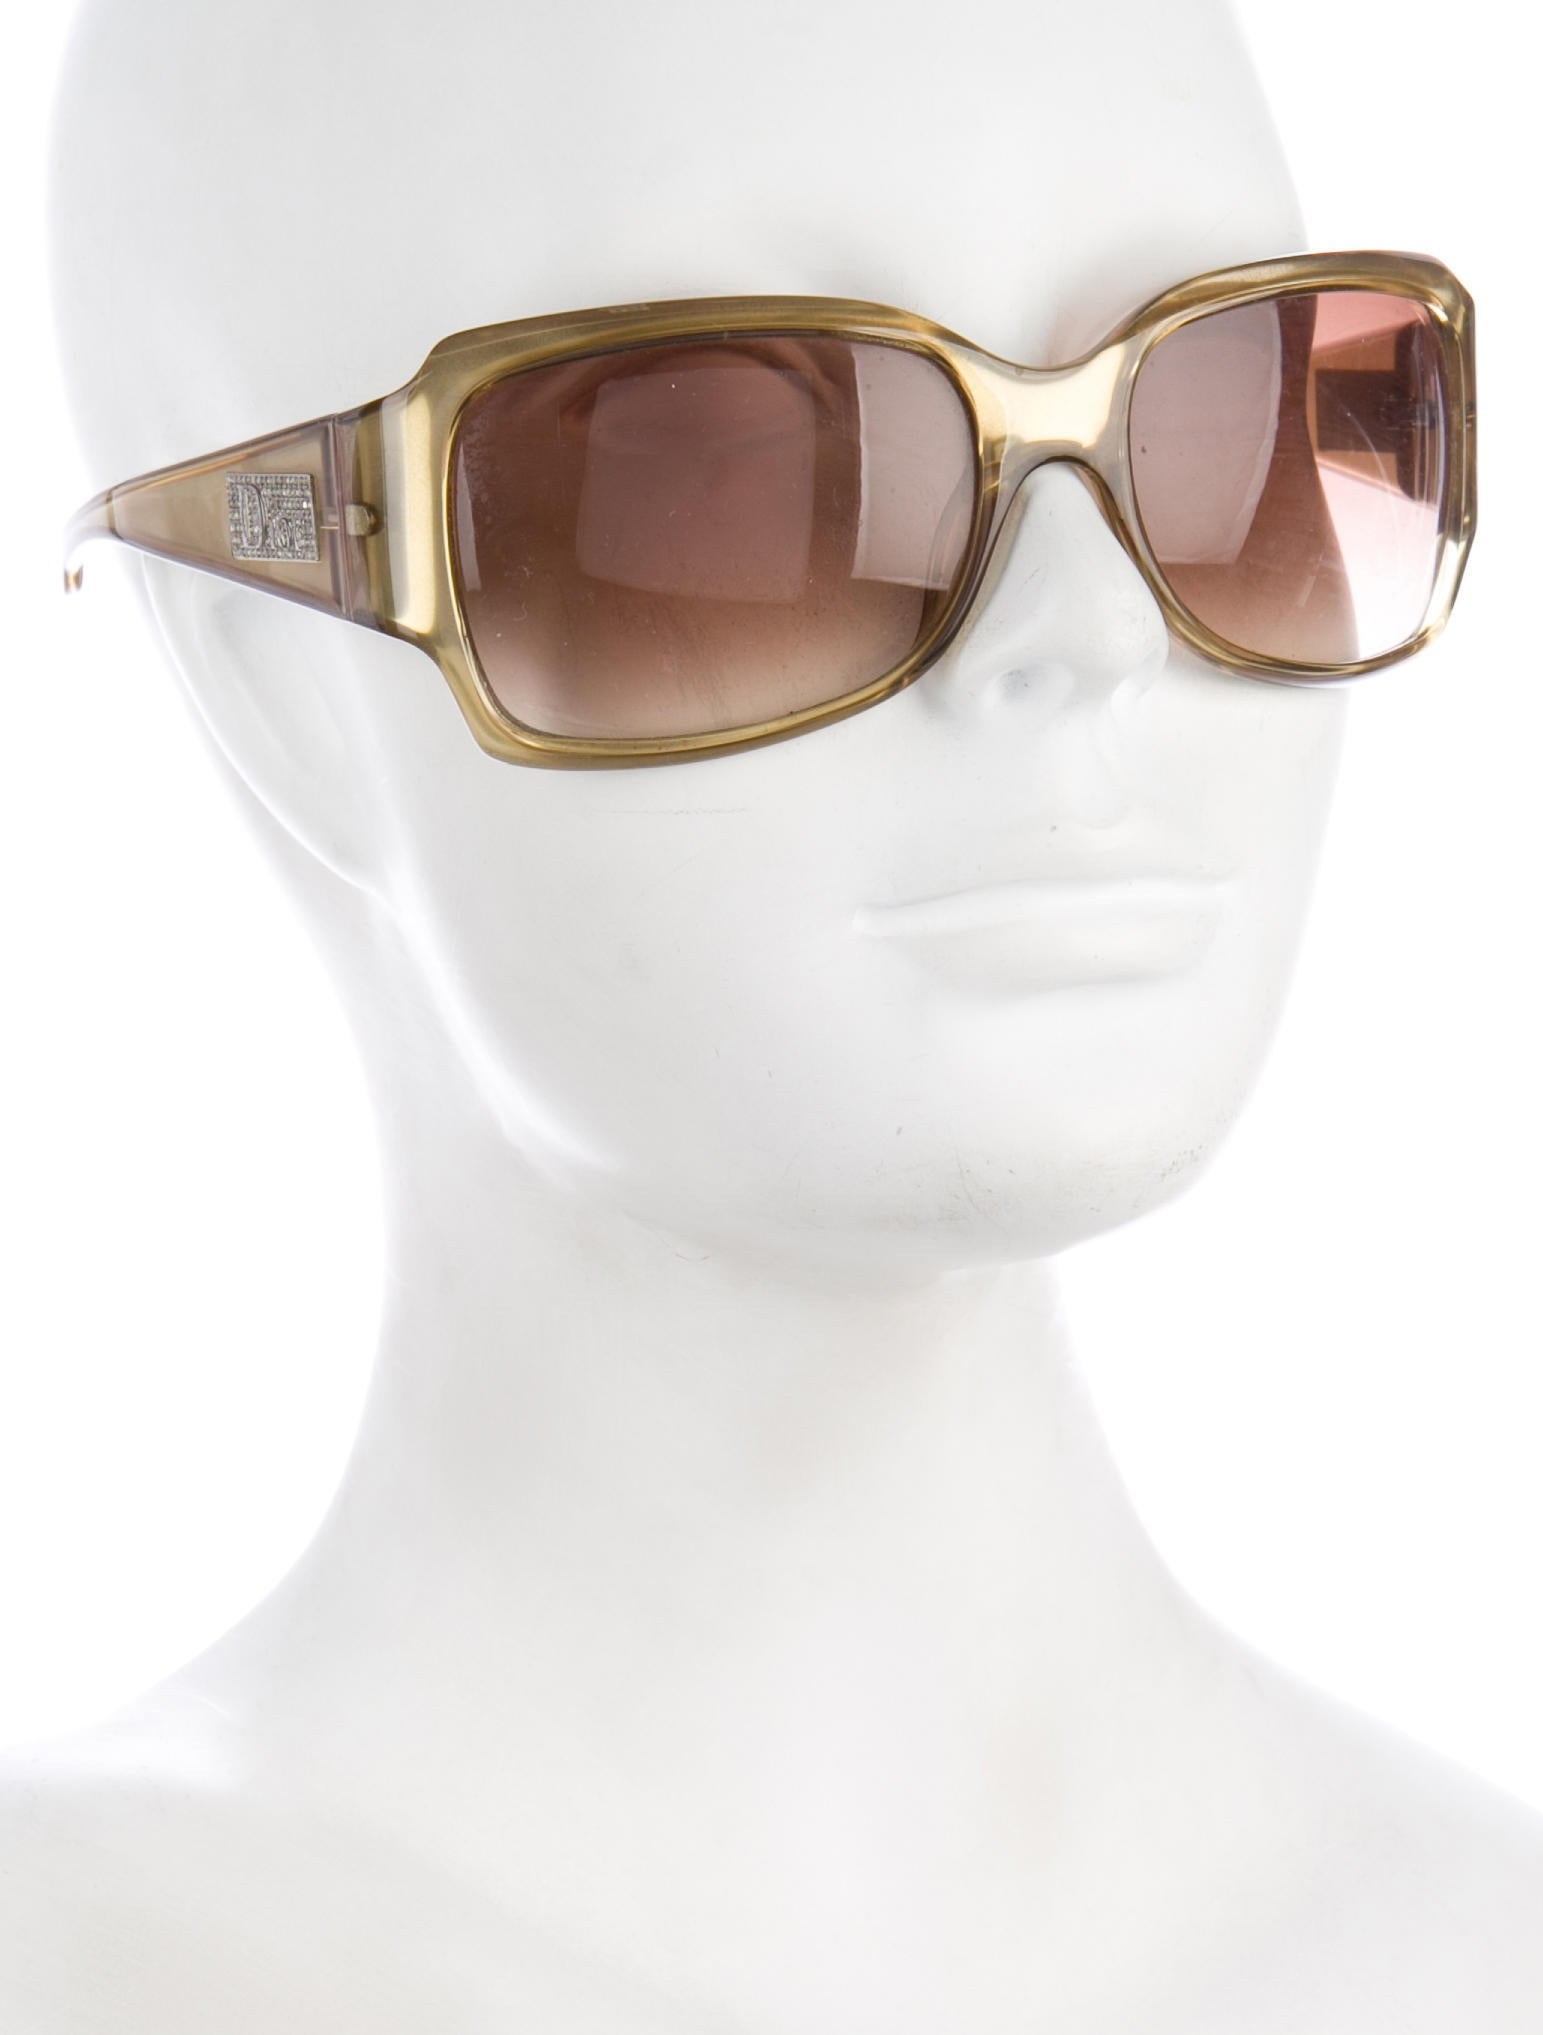 f9c46cced9681 Christian Dior Sunglasses Adiorable 2